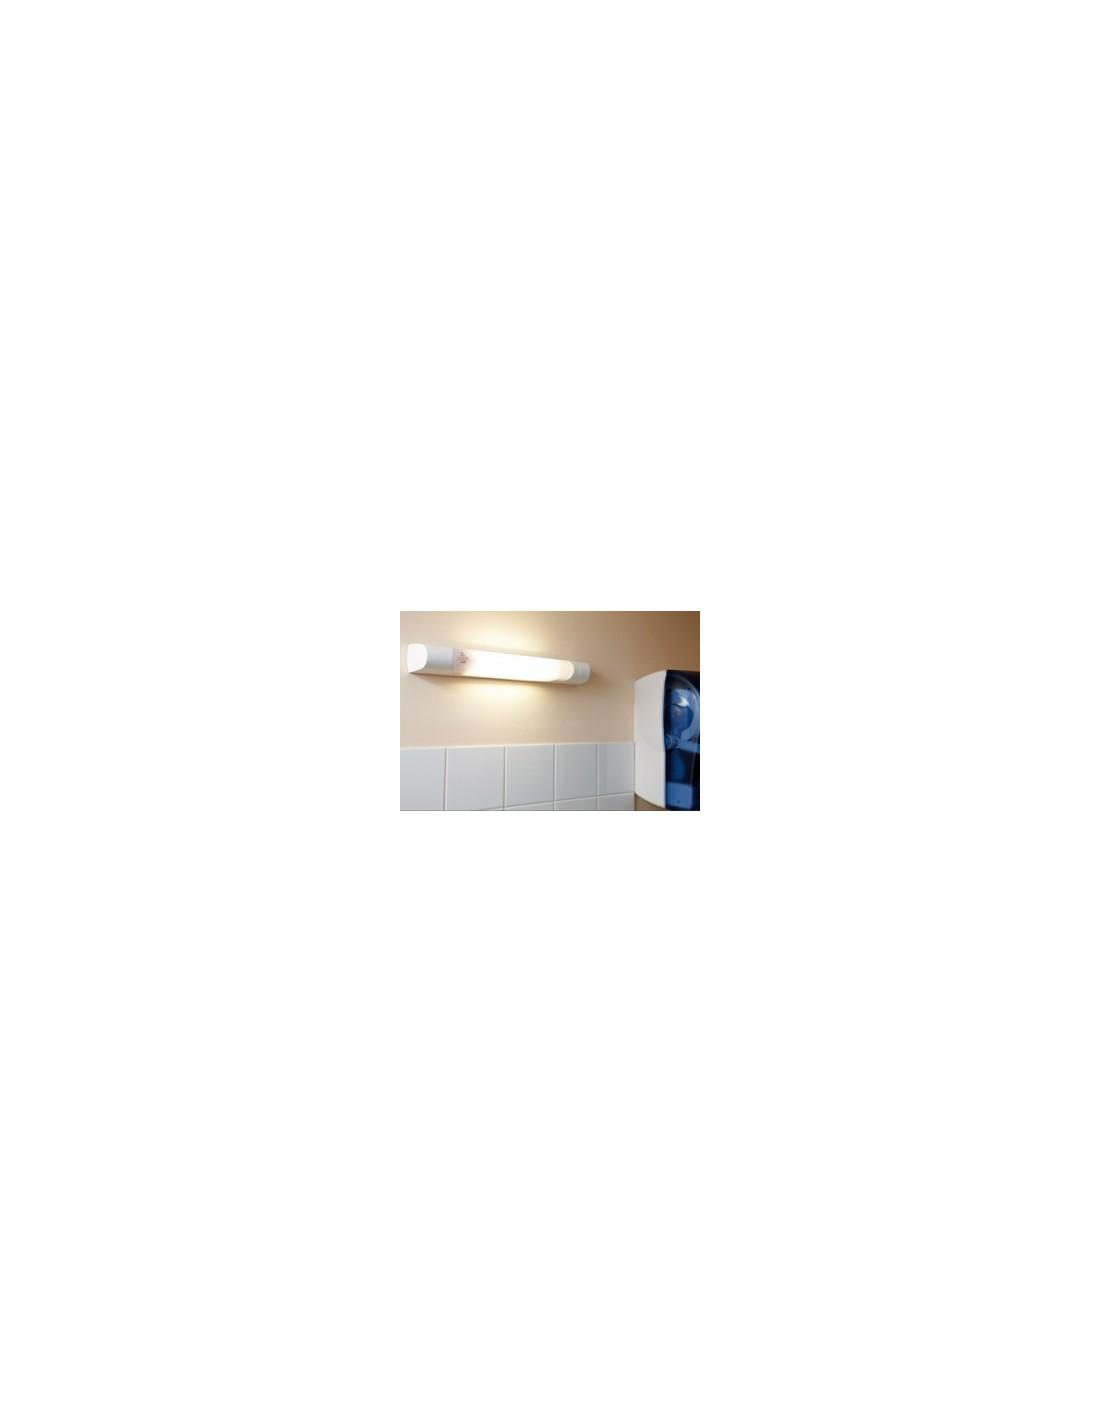 applique de salle de bains prismaline 75 w fluo. Black Bedroom Furniture Sets. Home Design Ideas